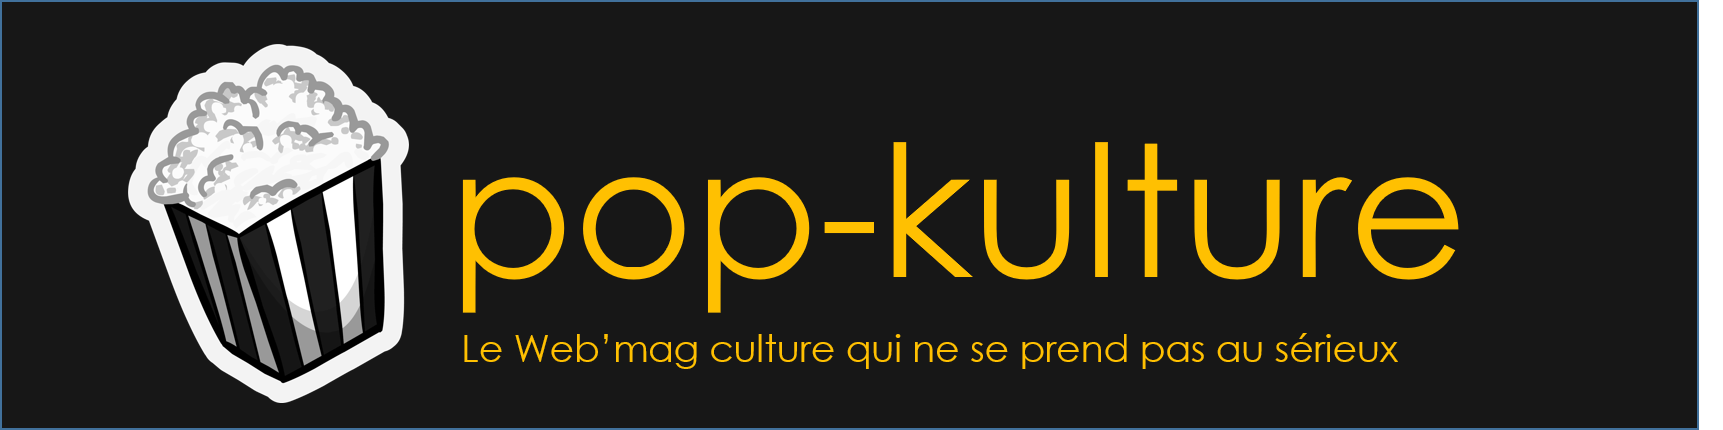 pop-kulture-logo-2